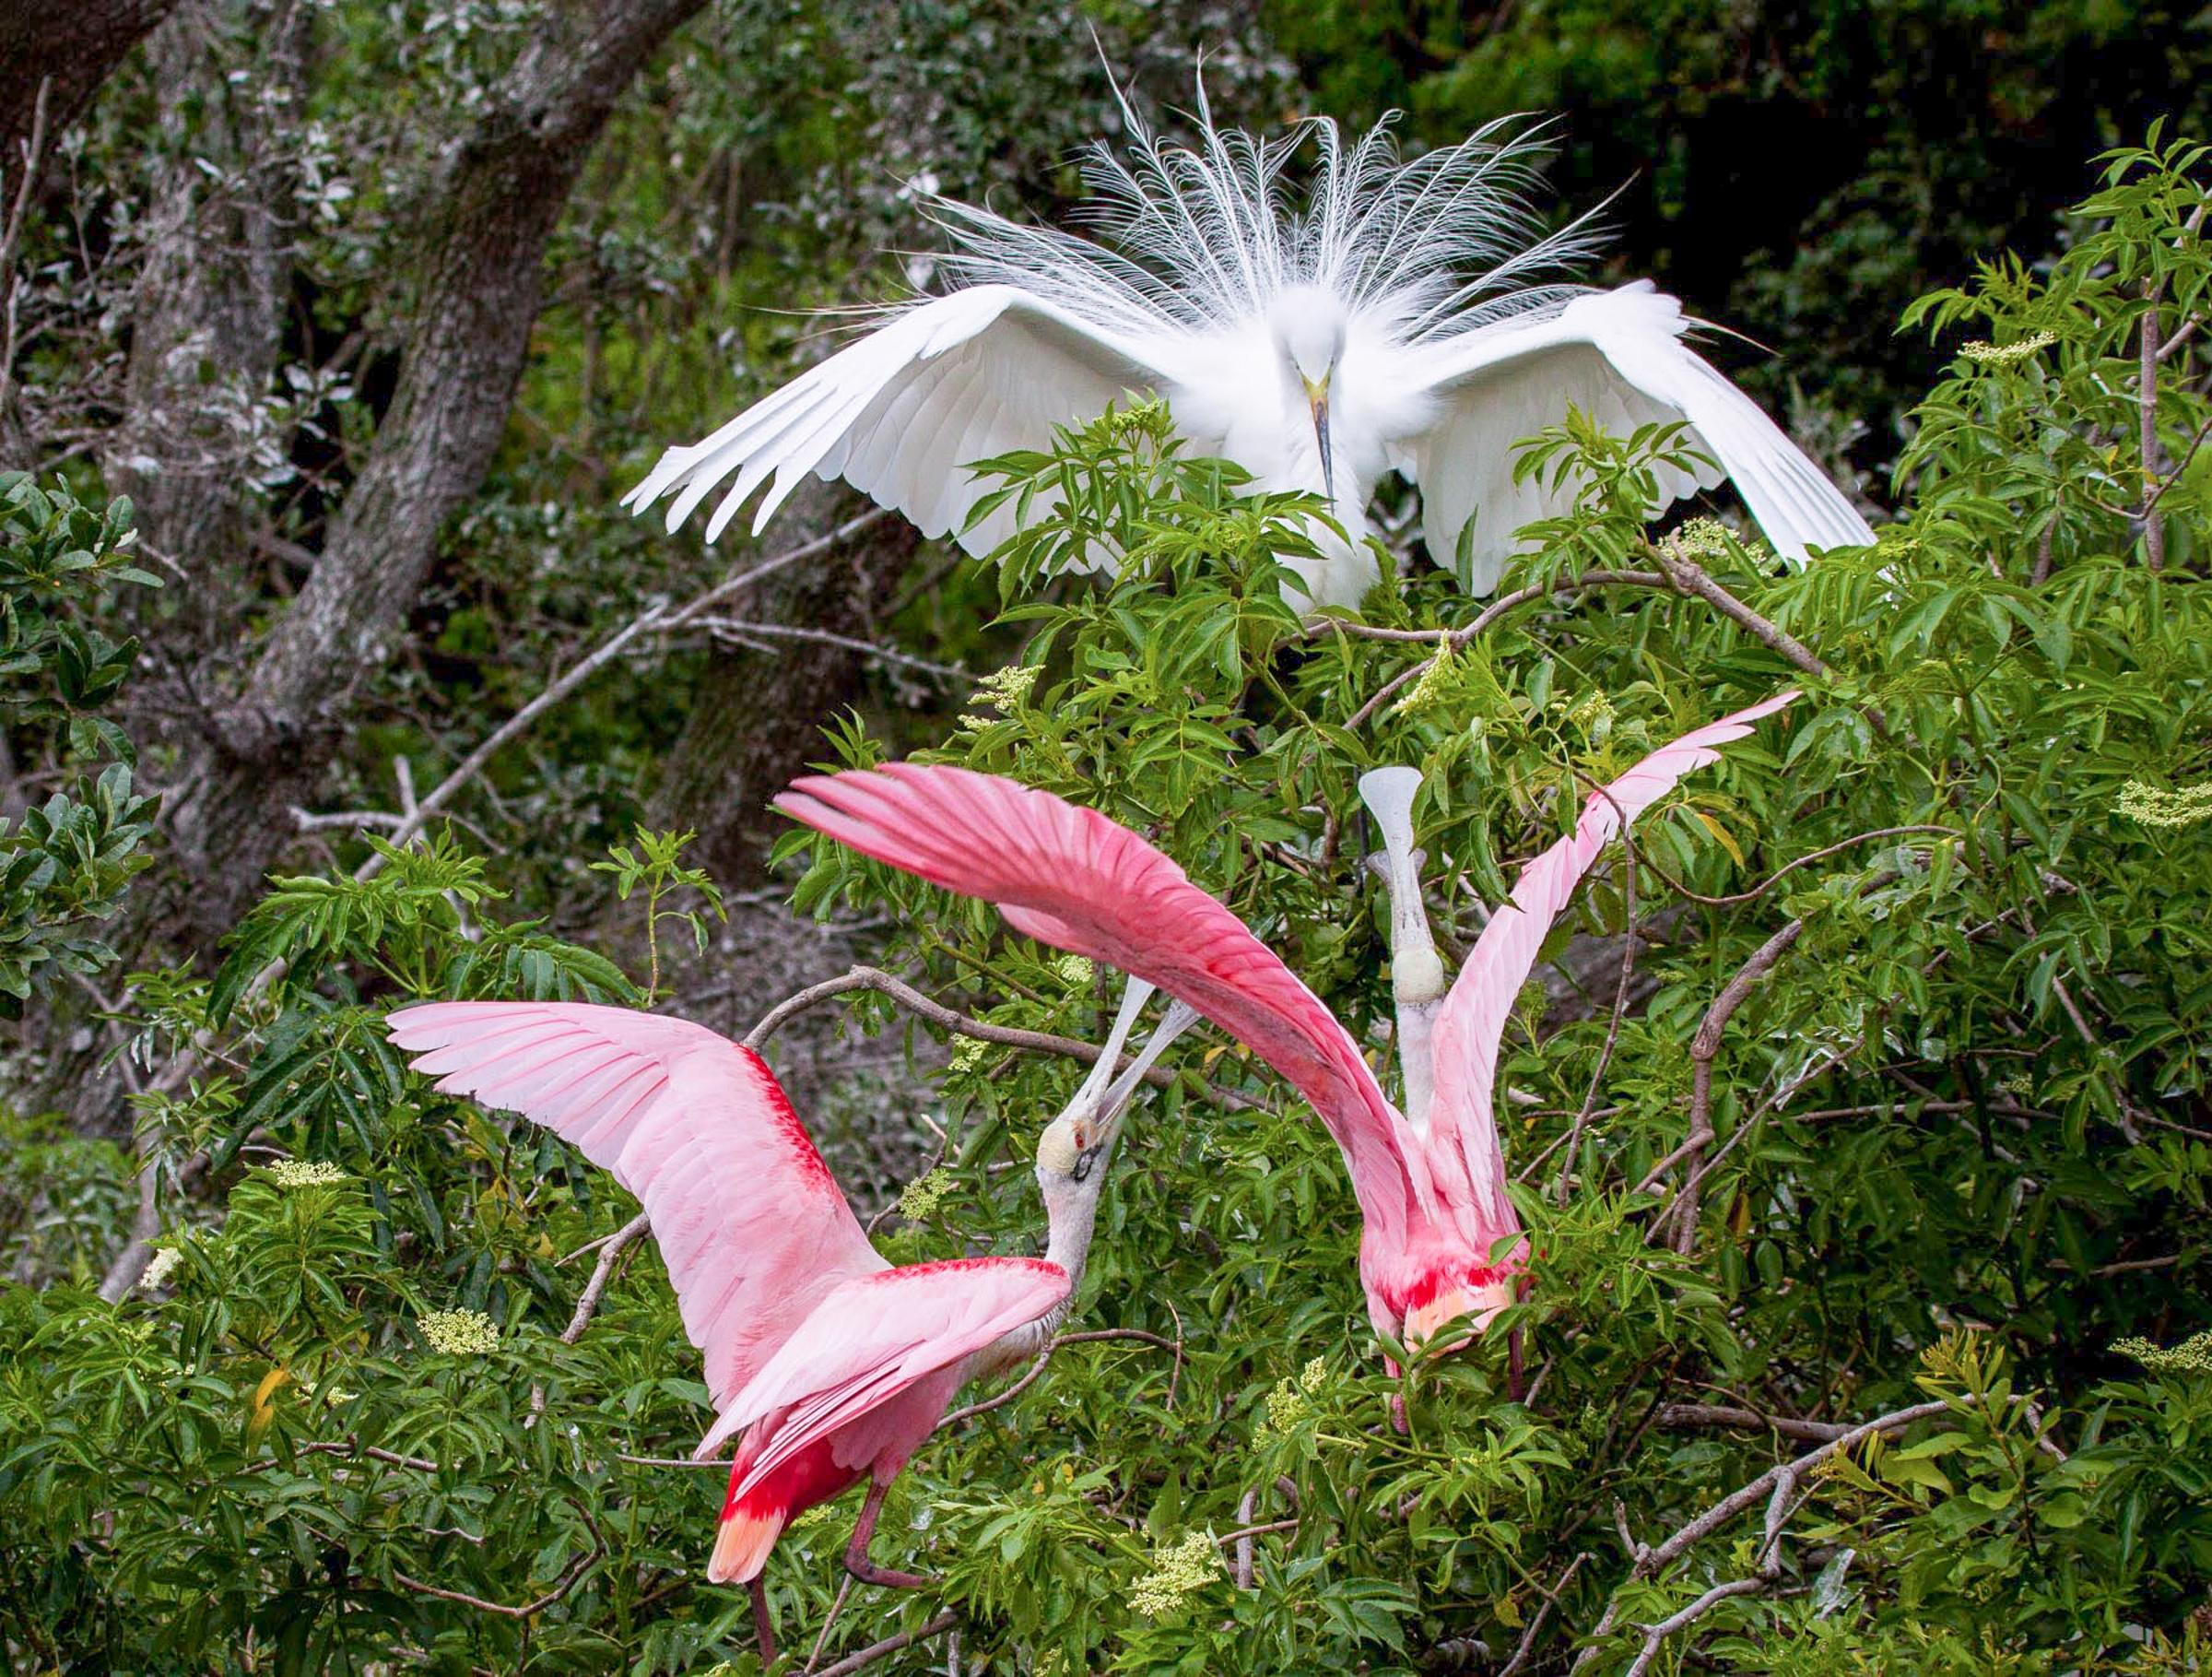 Snowy Egret and Roseate Spoonbill. Photo: Chuck Murphy / Audubon Photography Awards.